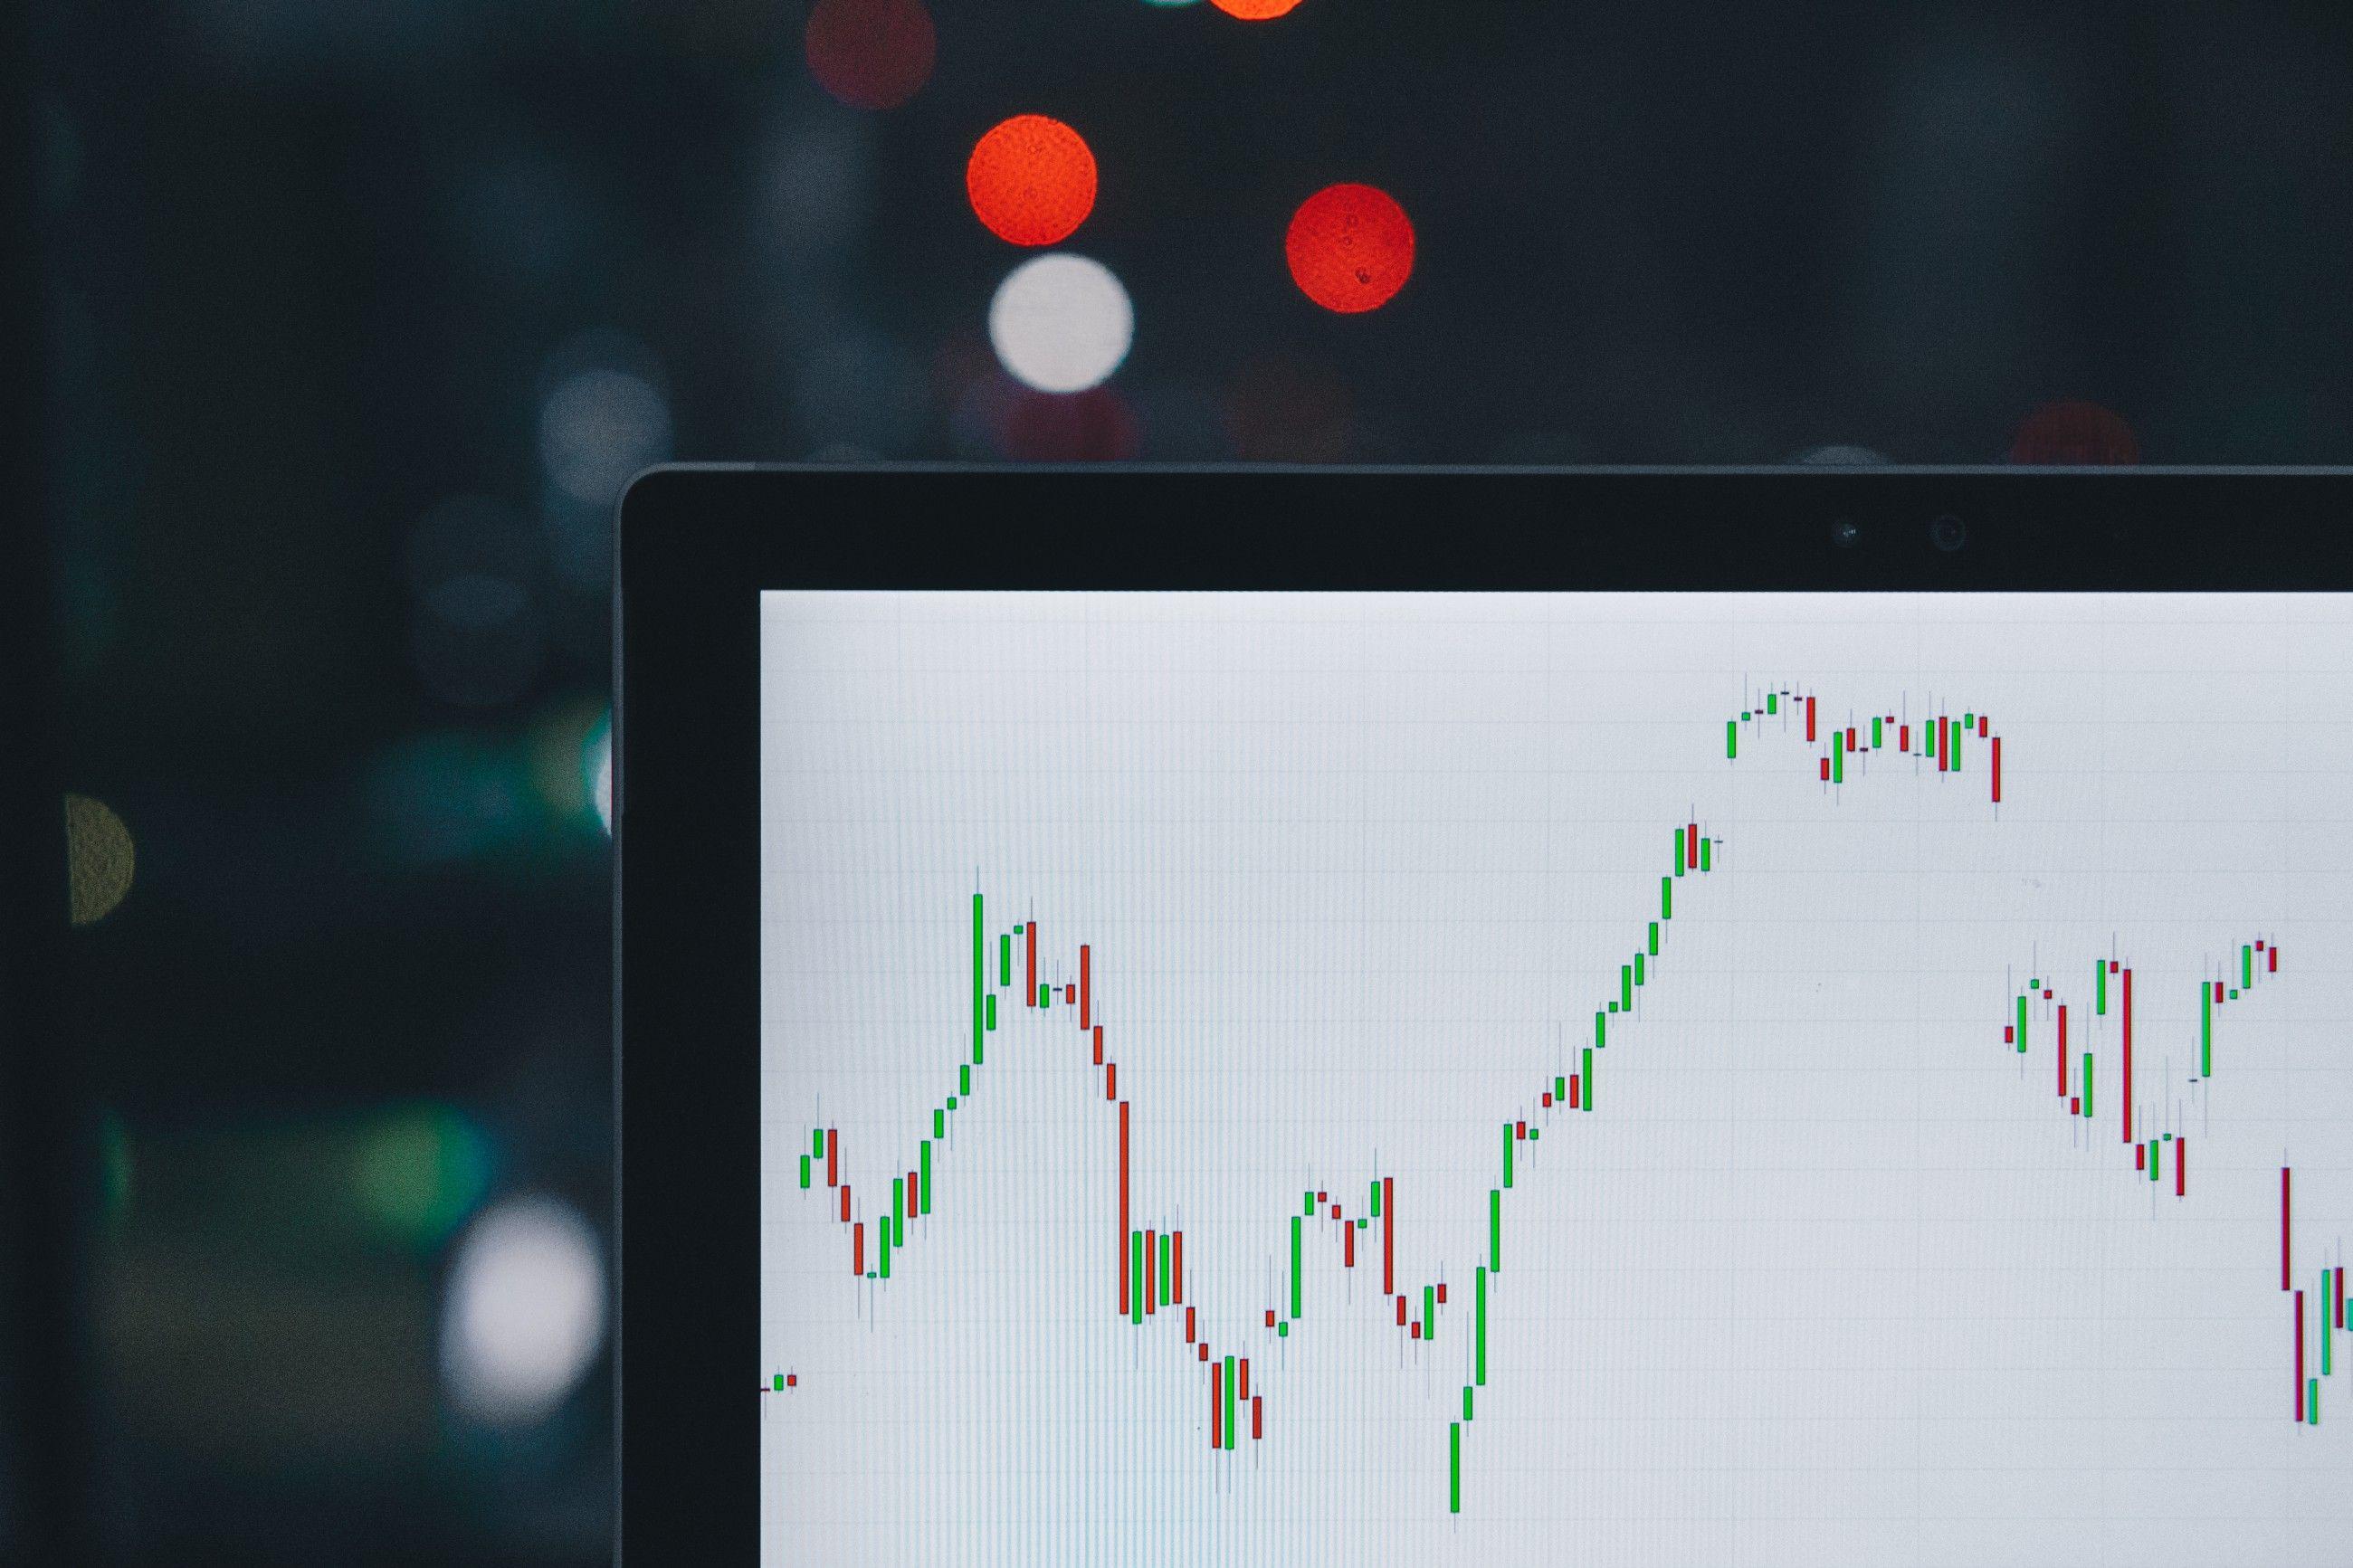 Stock Market Prediction for the Australian Securities